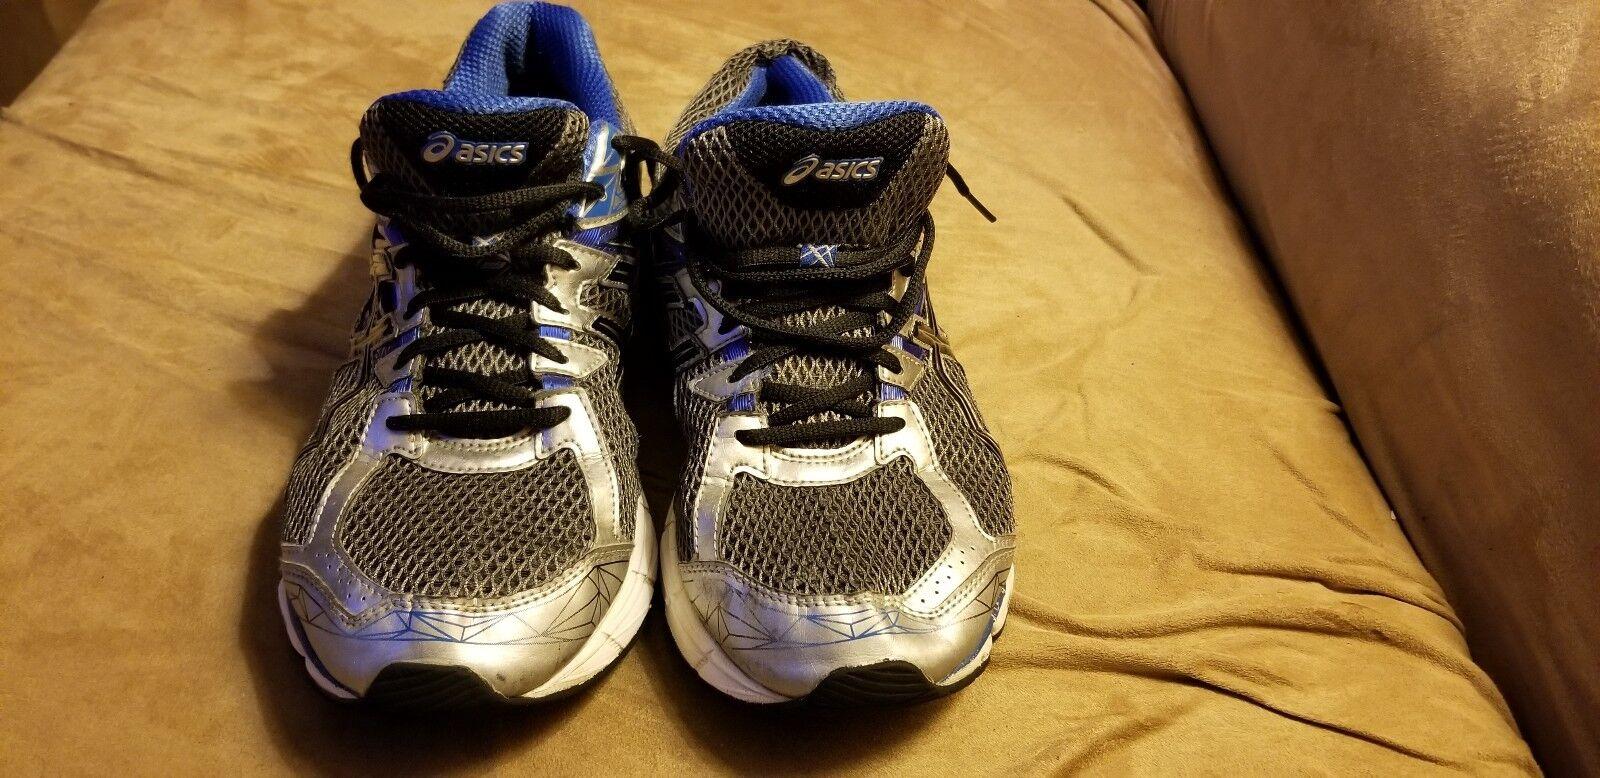 Mens Größe 4e 11 Asics Gel Gt 1000 Run Walk Cleaned wide